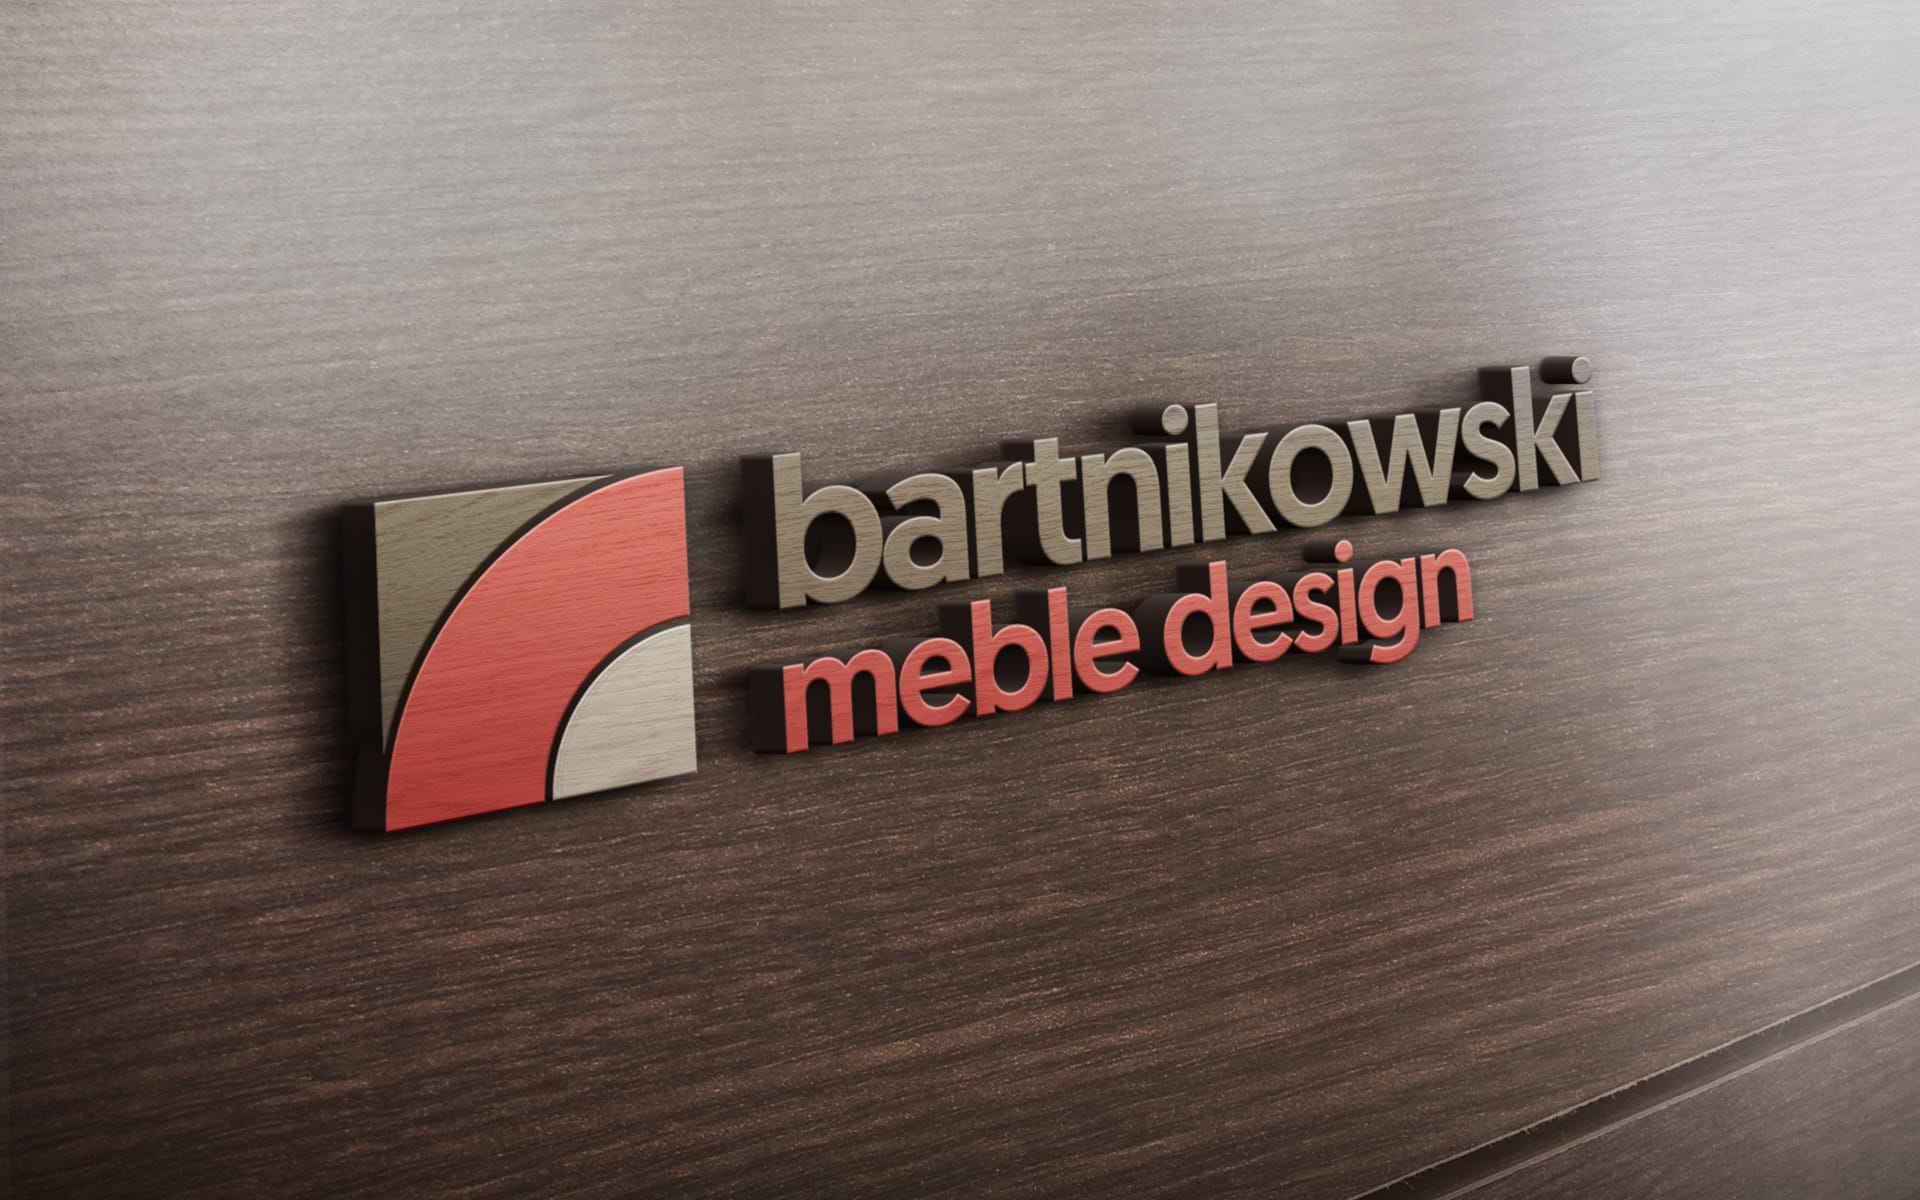 bartnikowski meble design logo firmowe